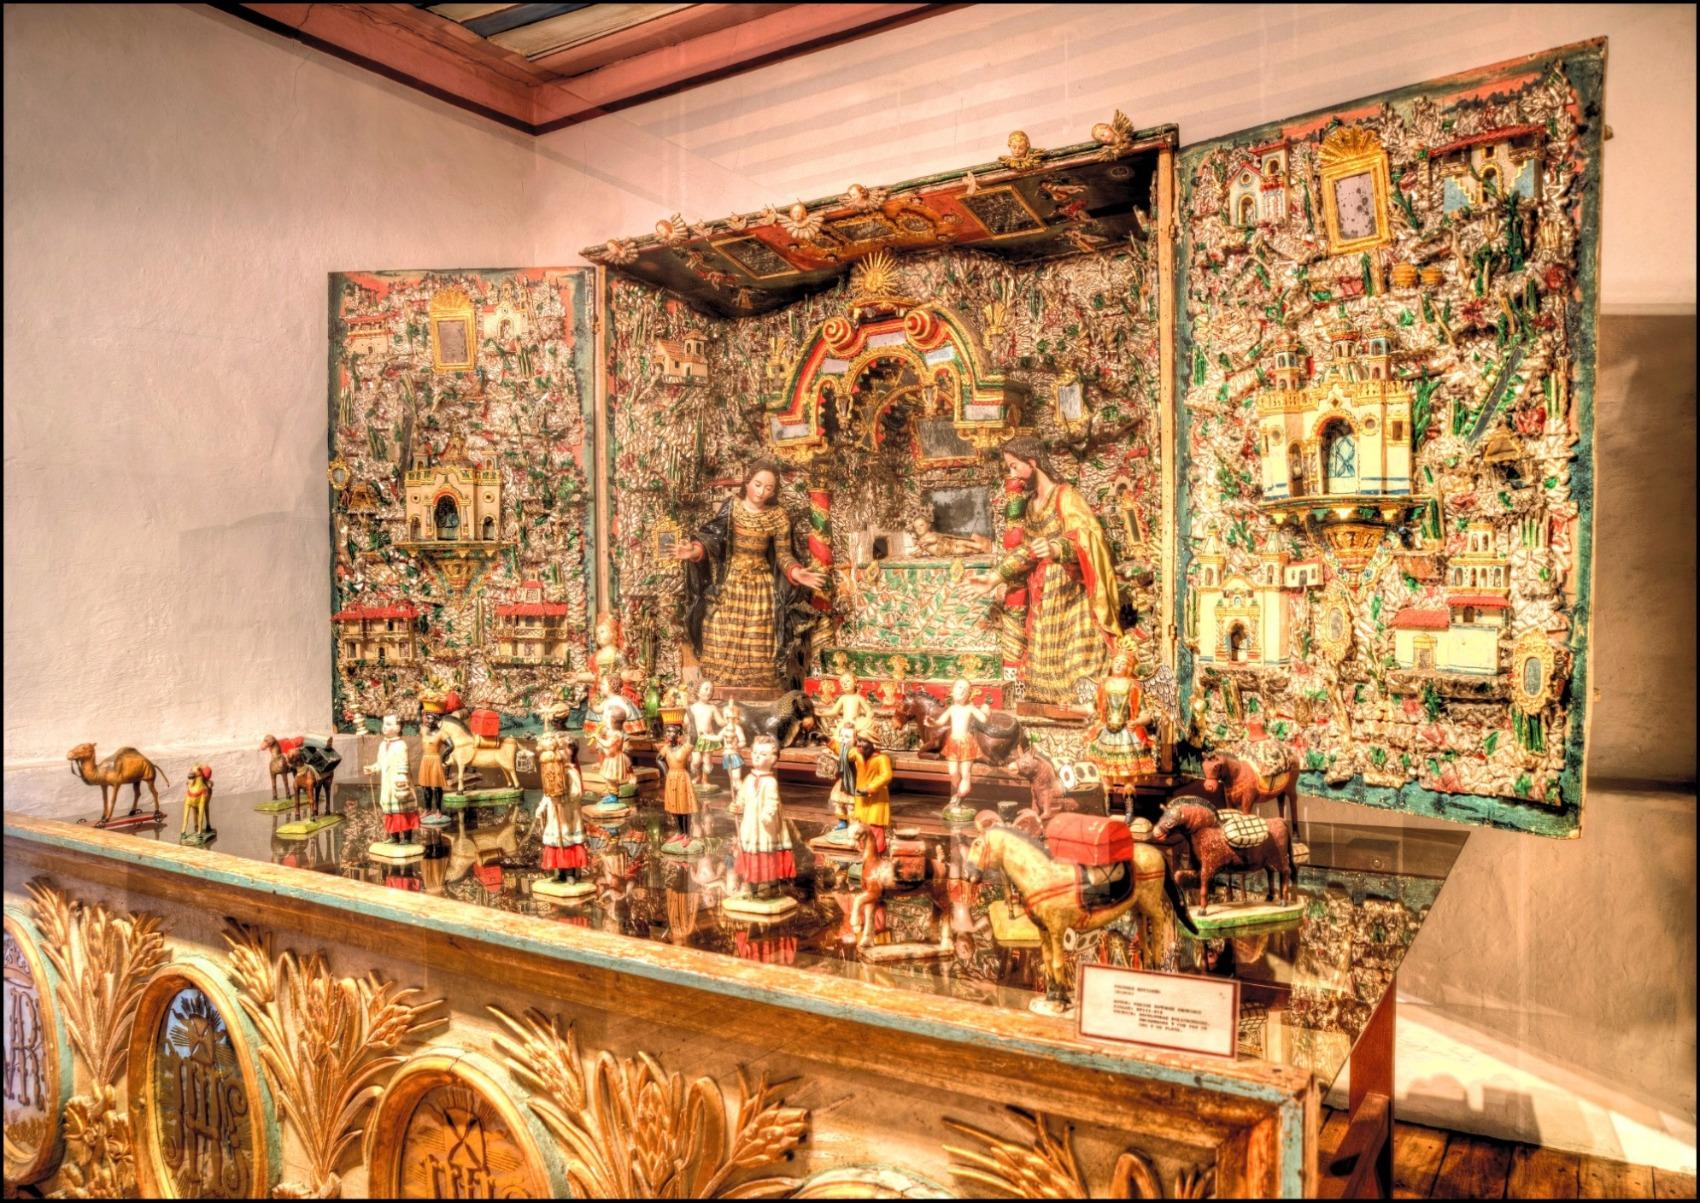 Las Conceptas Cloister & Museum